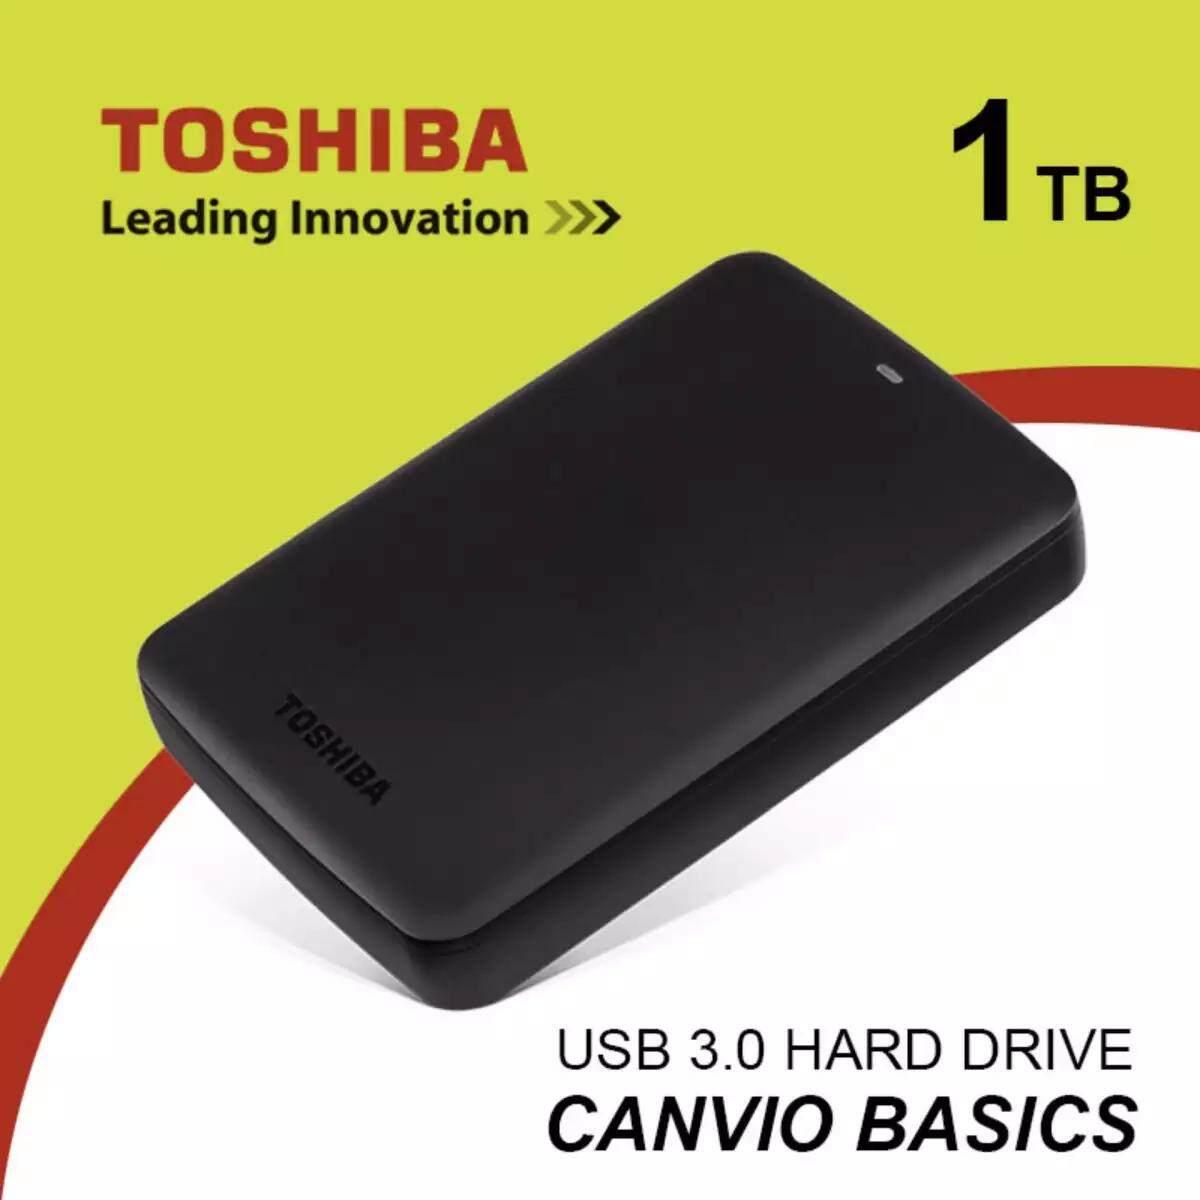 Toshiba External Hard Drives Price In Malaysia Best Hardisk Canvio 1tb Basics 30 Usb Portable Drive Disk Hdd Black